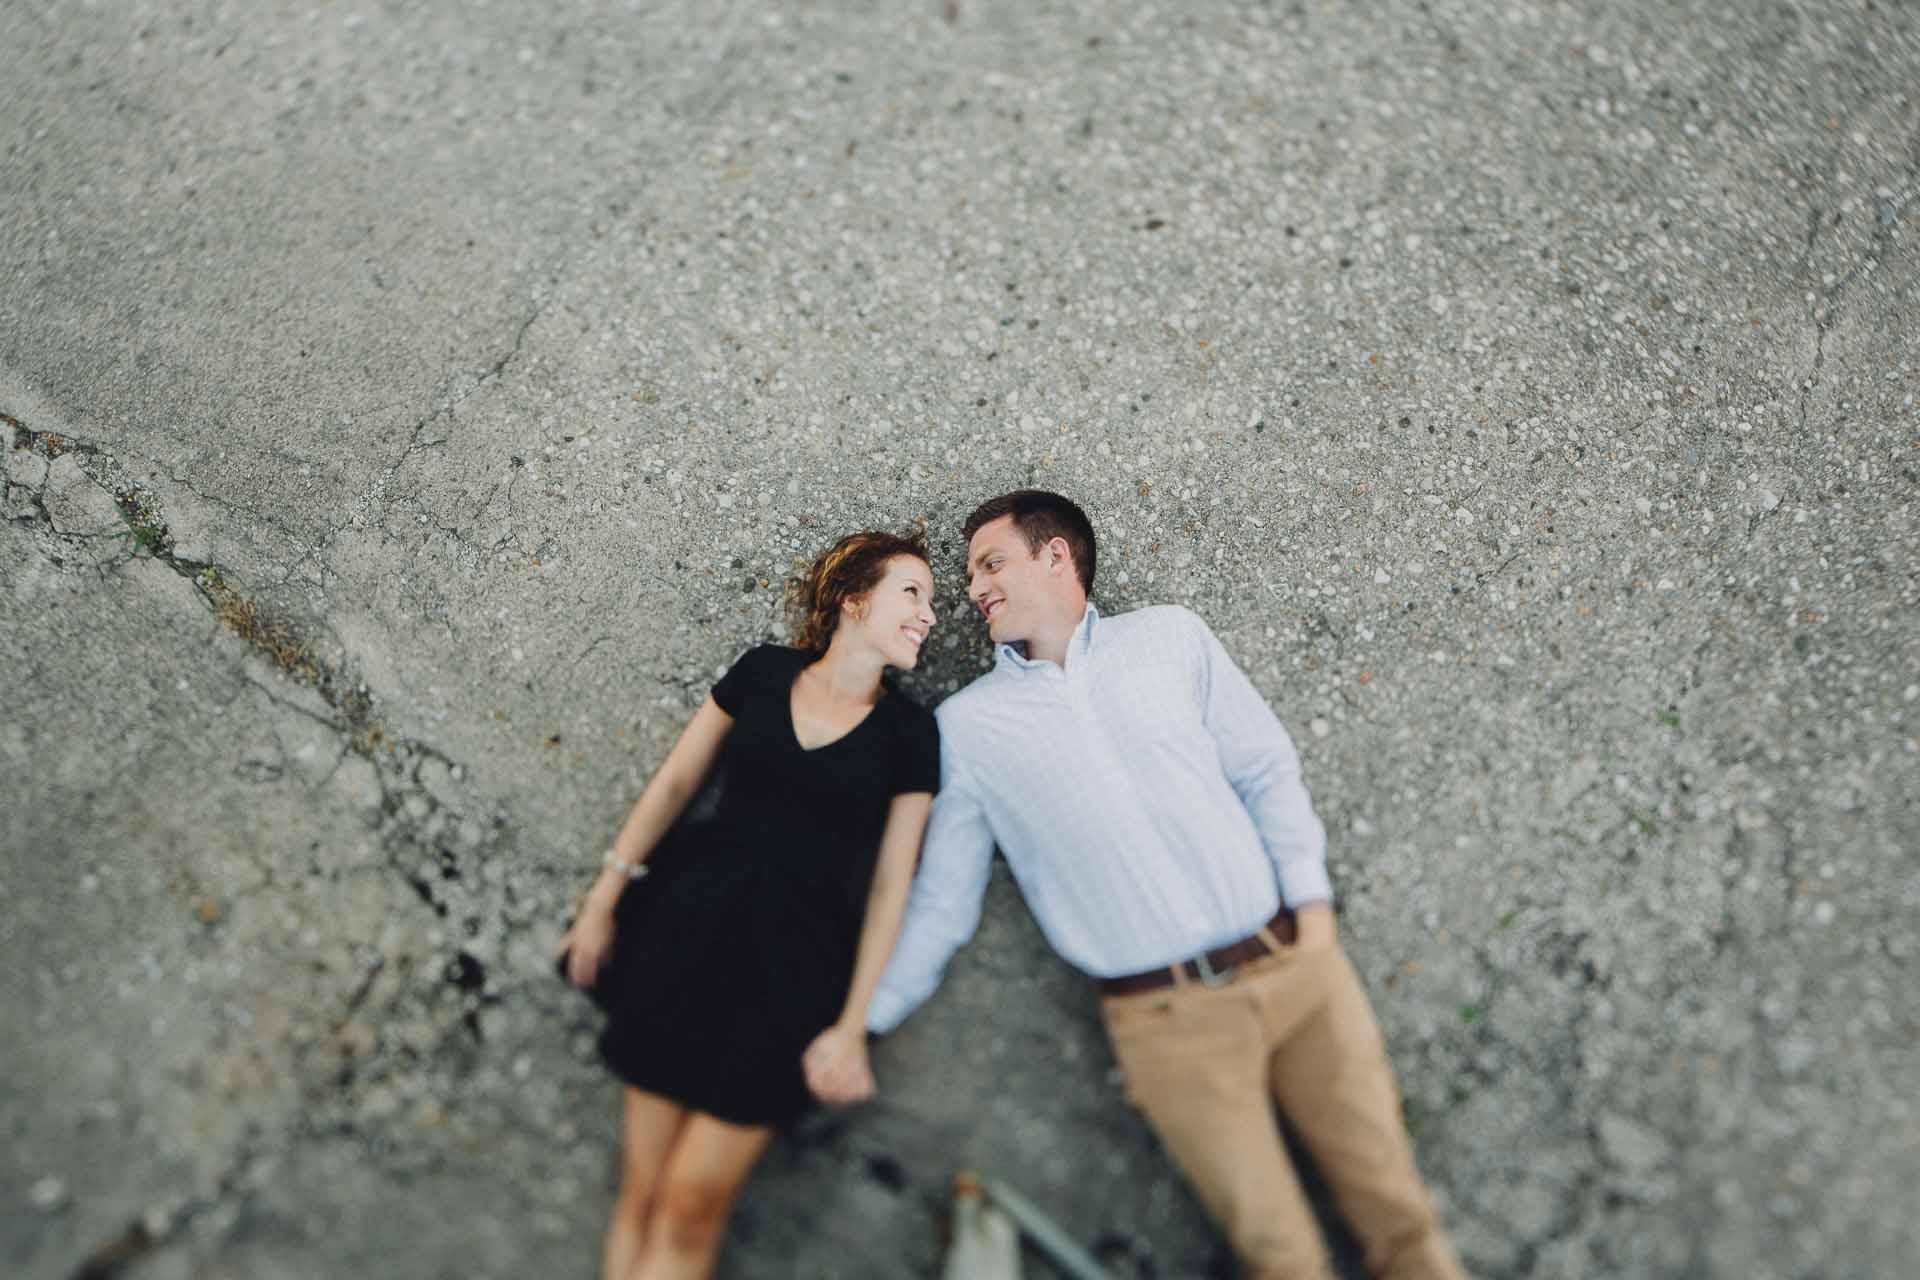 Emily-Dan-Dayton-Engagement-028@2x.jpg